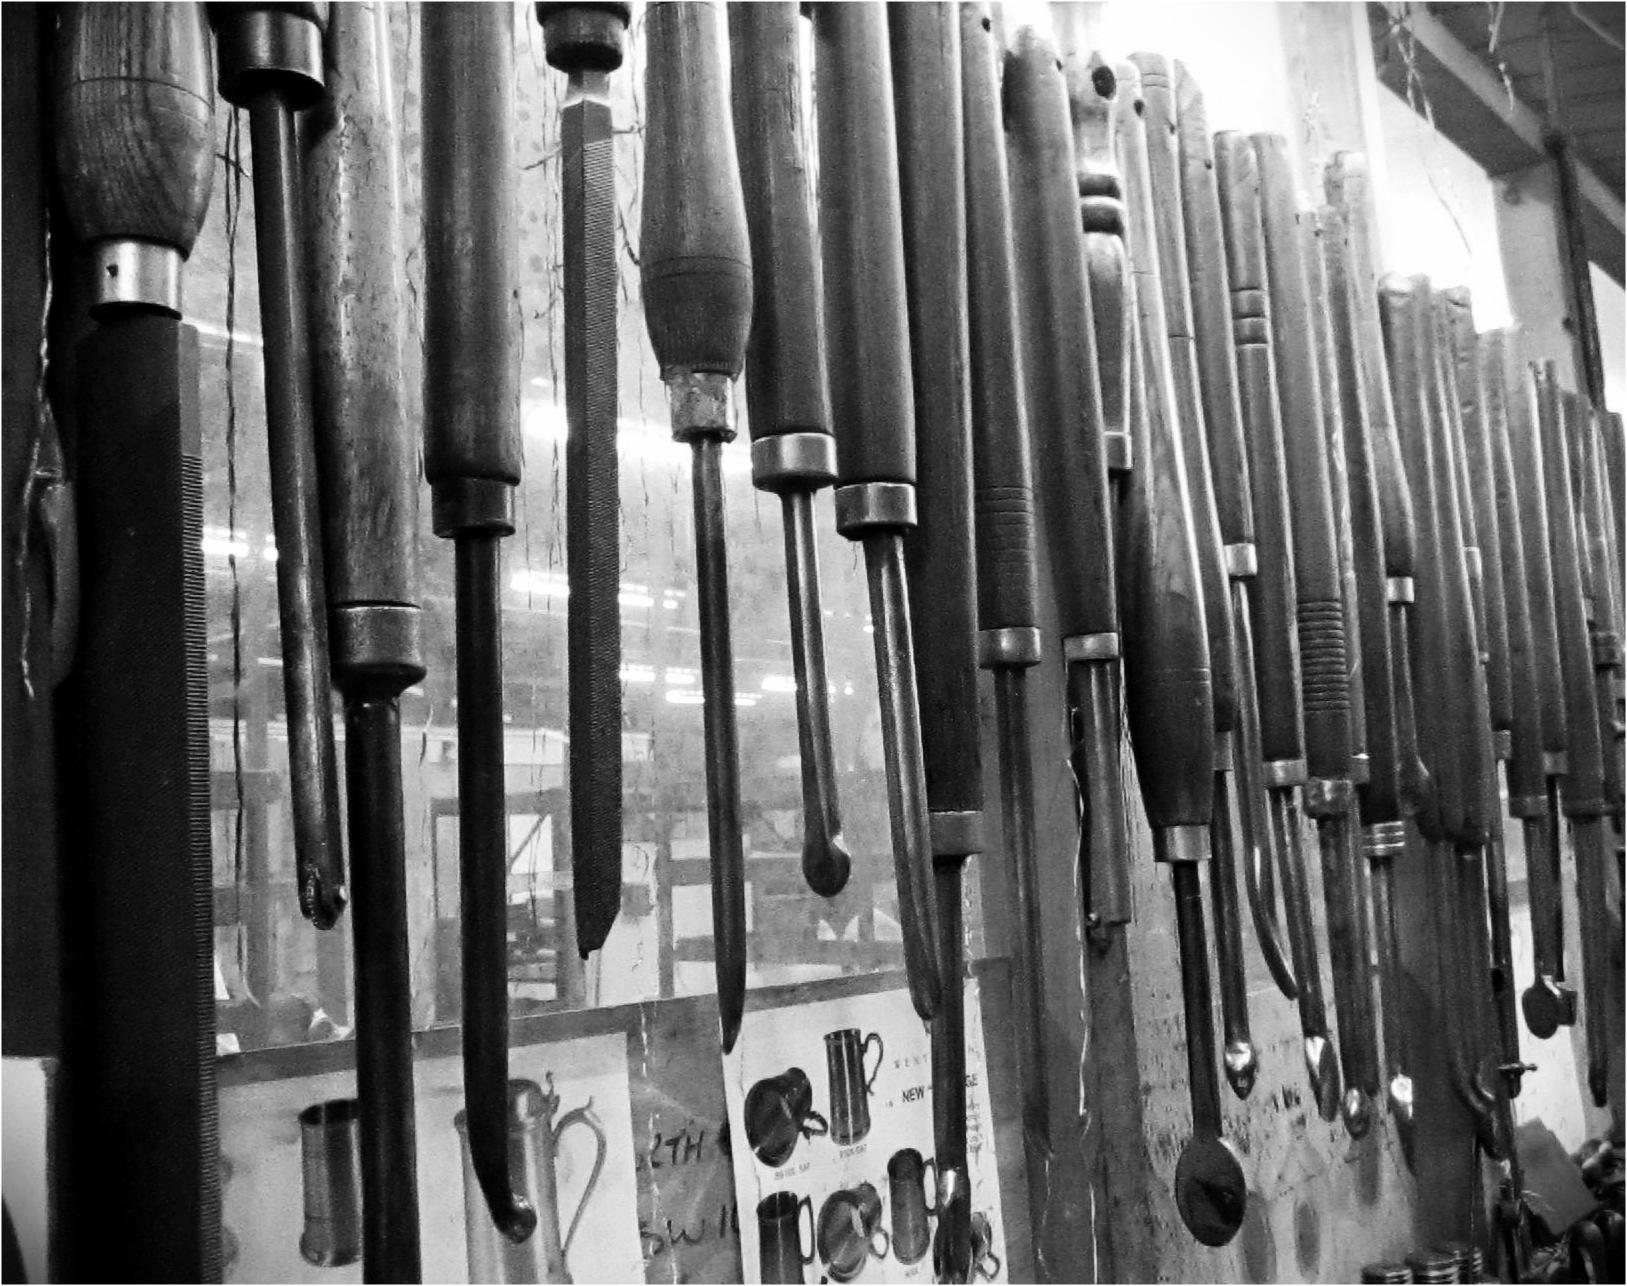 Bill Kerry's Spinning tools